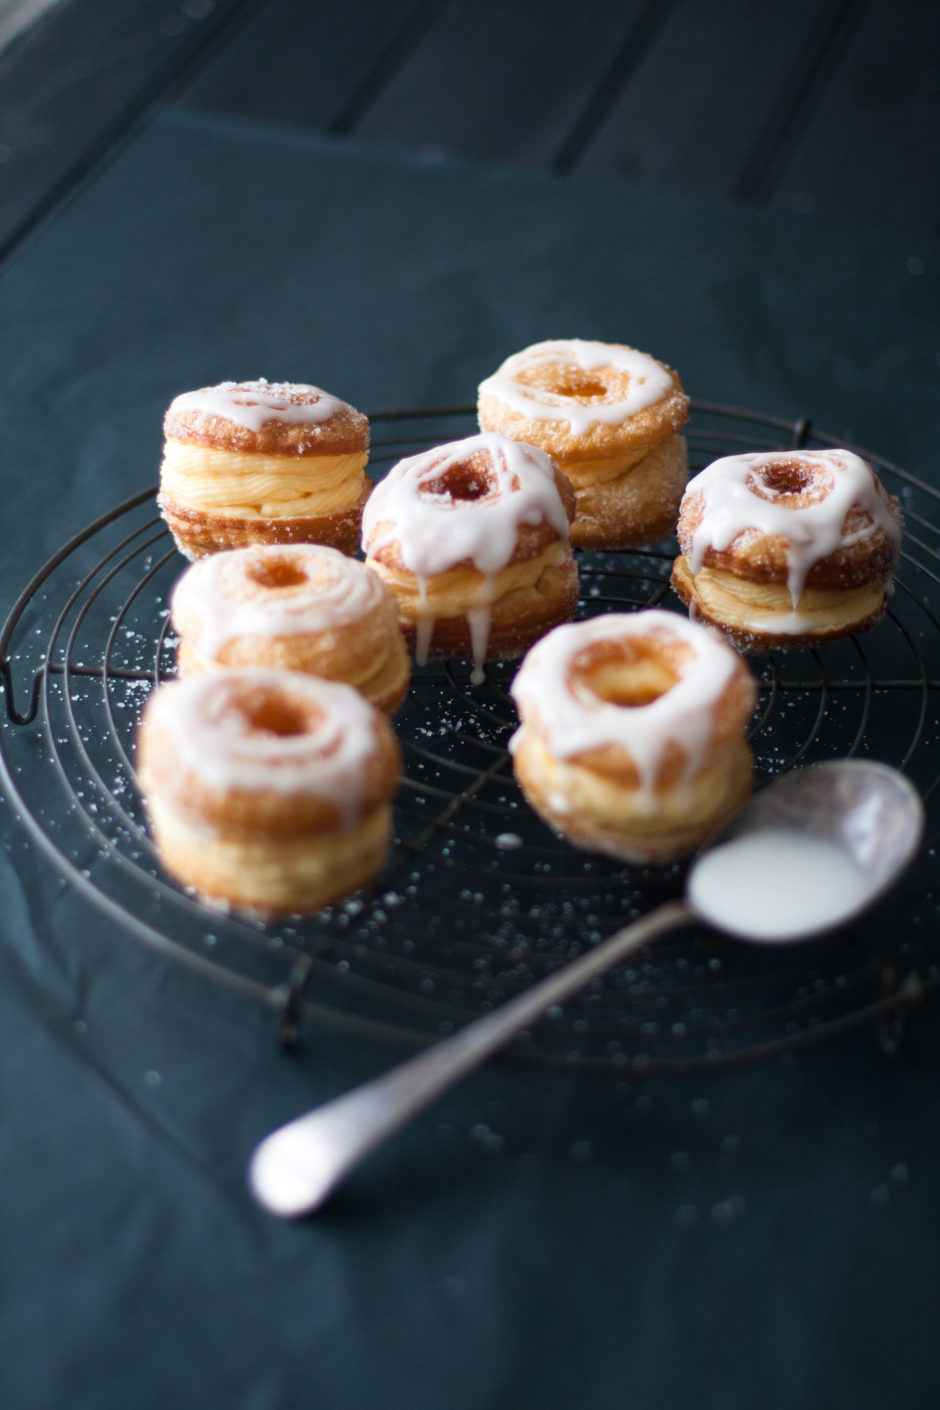 Cheats 'Cronuts' with Orange-infused Custard and Lemon Glaze